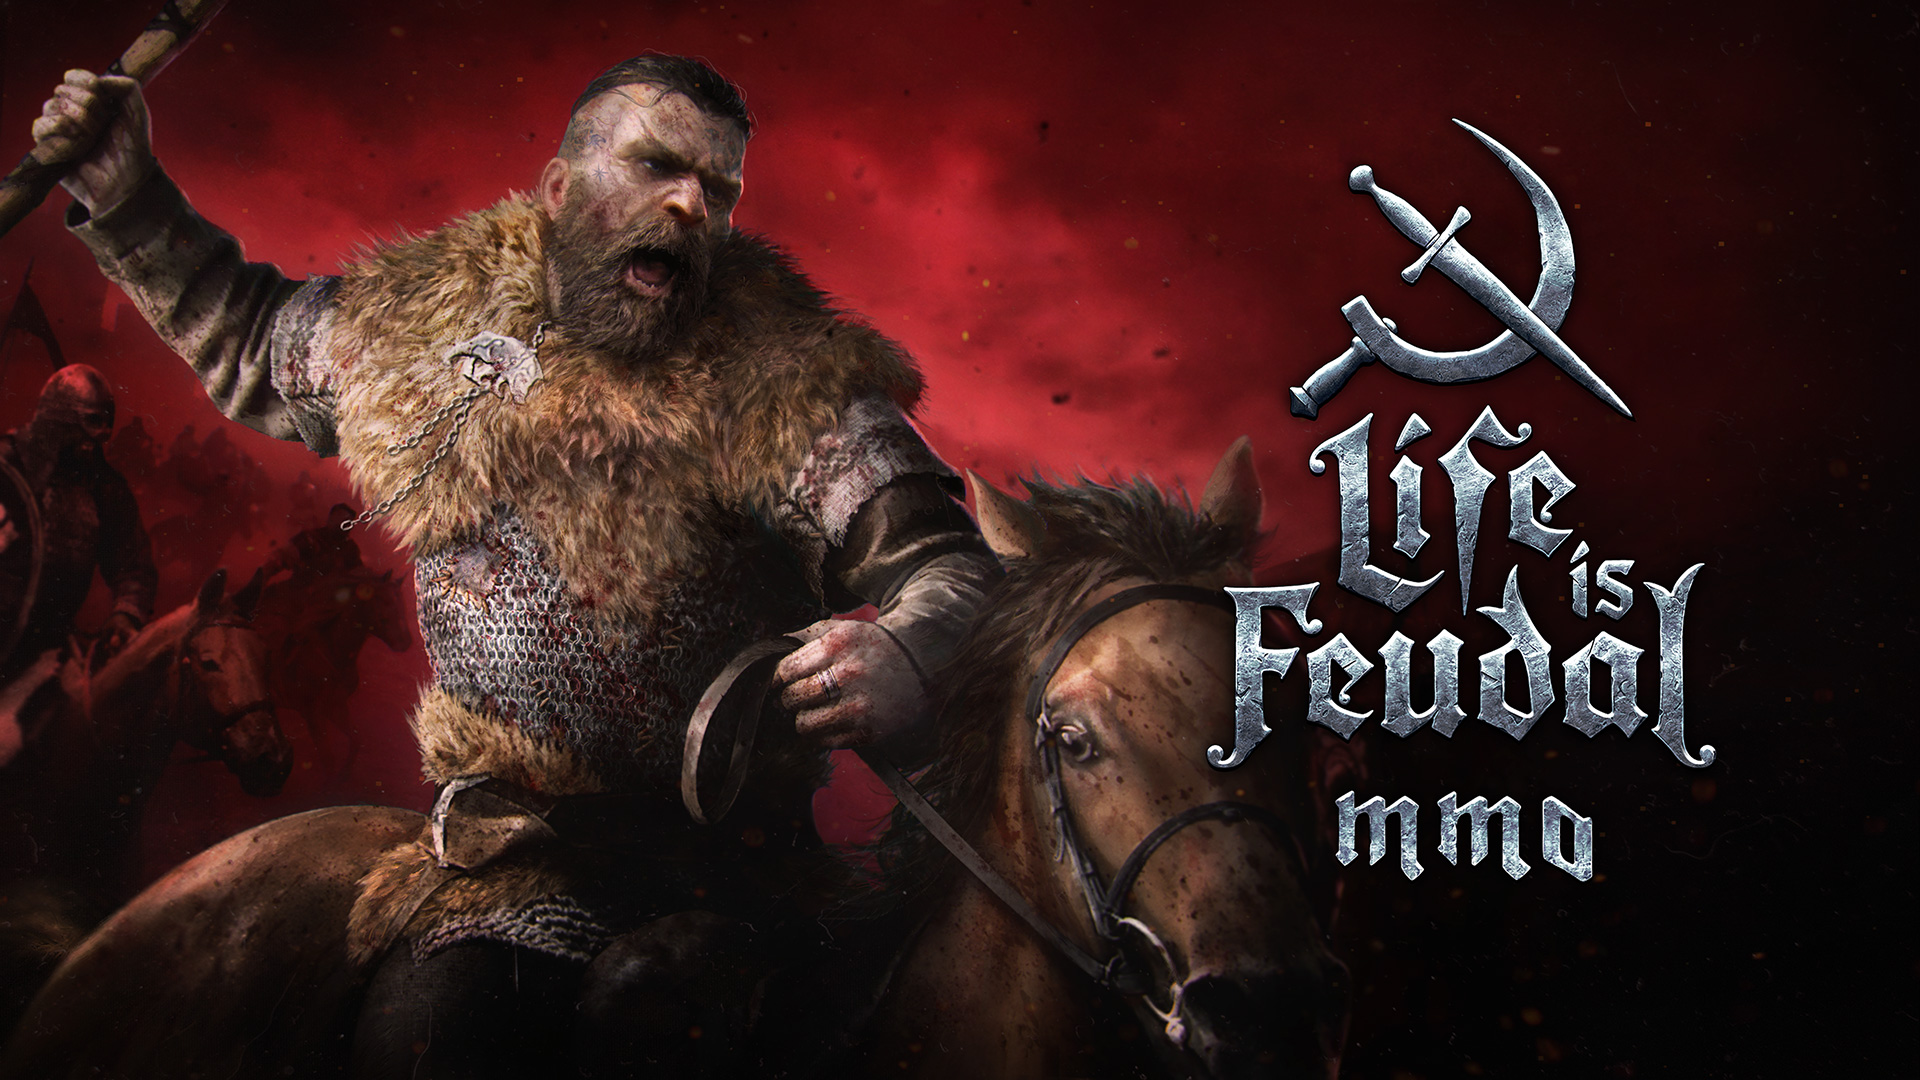 Life is feudal mmo час силы ролевая игра живого действия сценарий